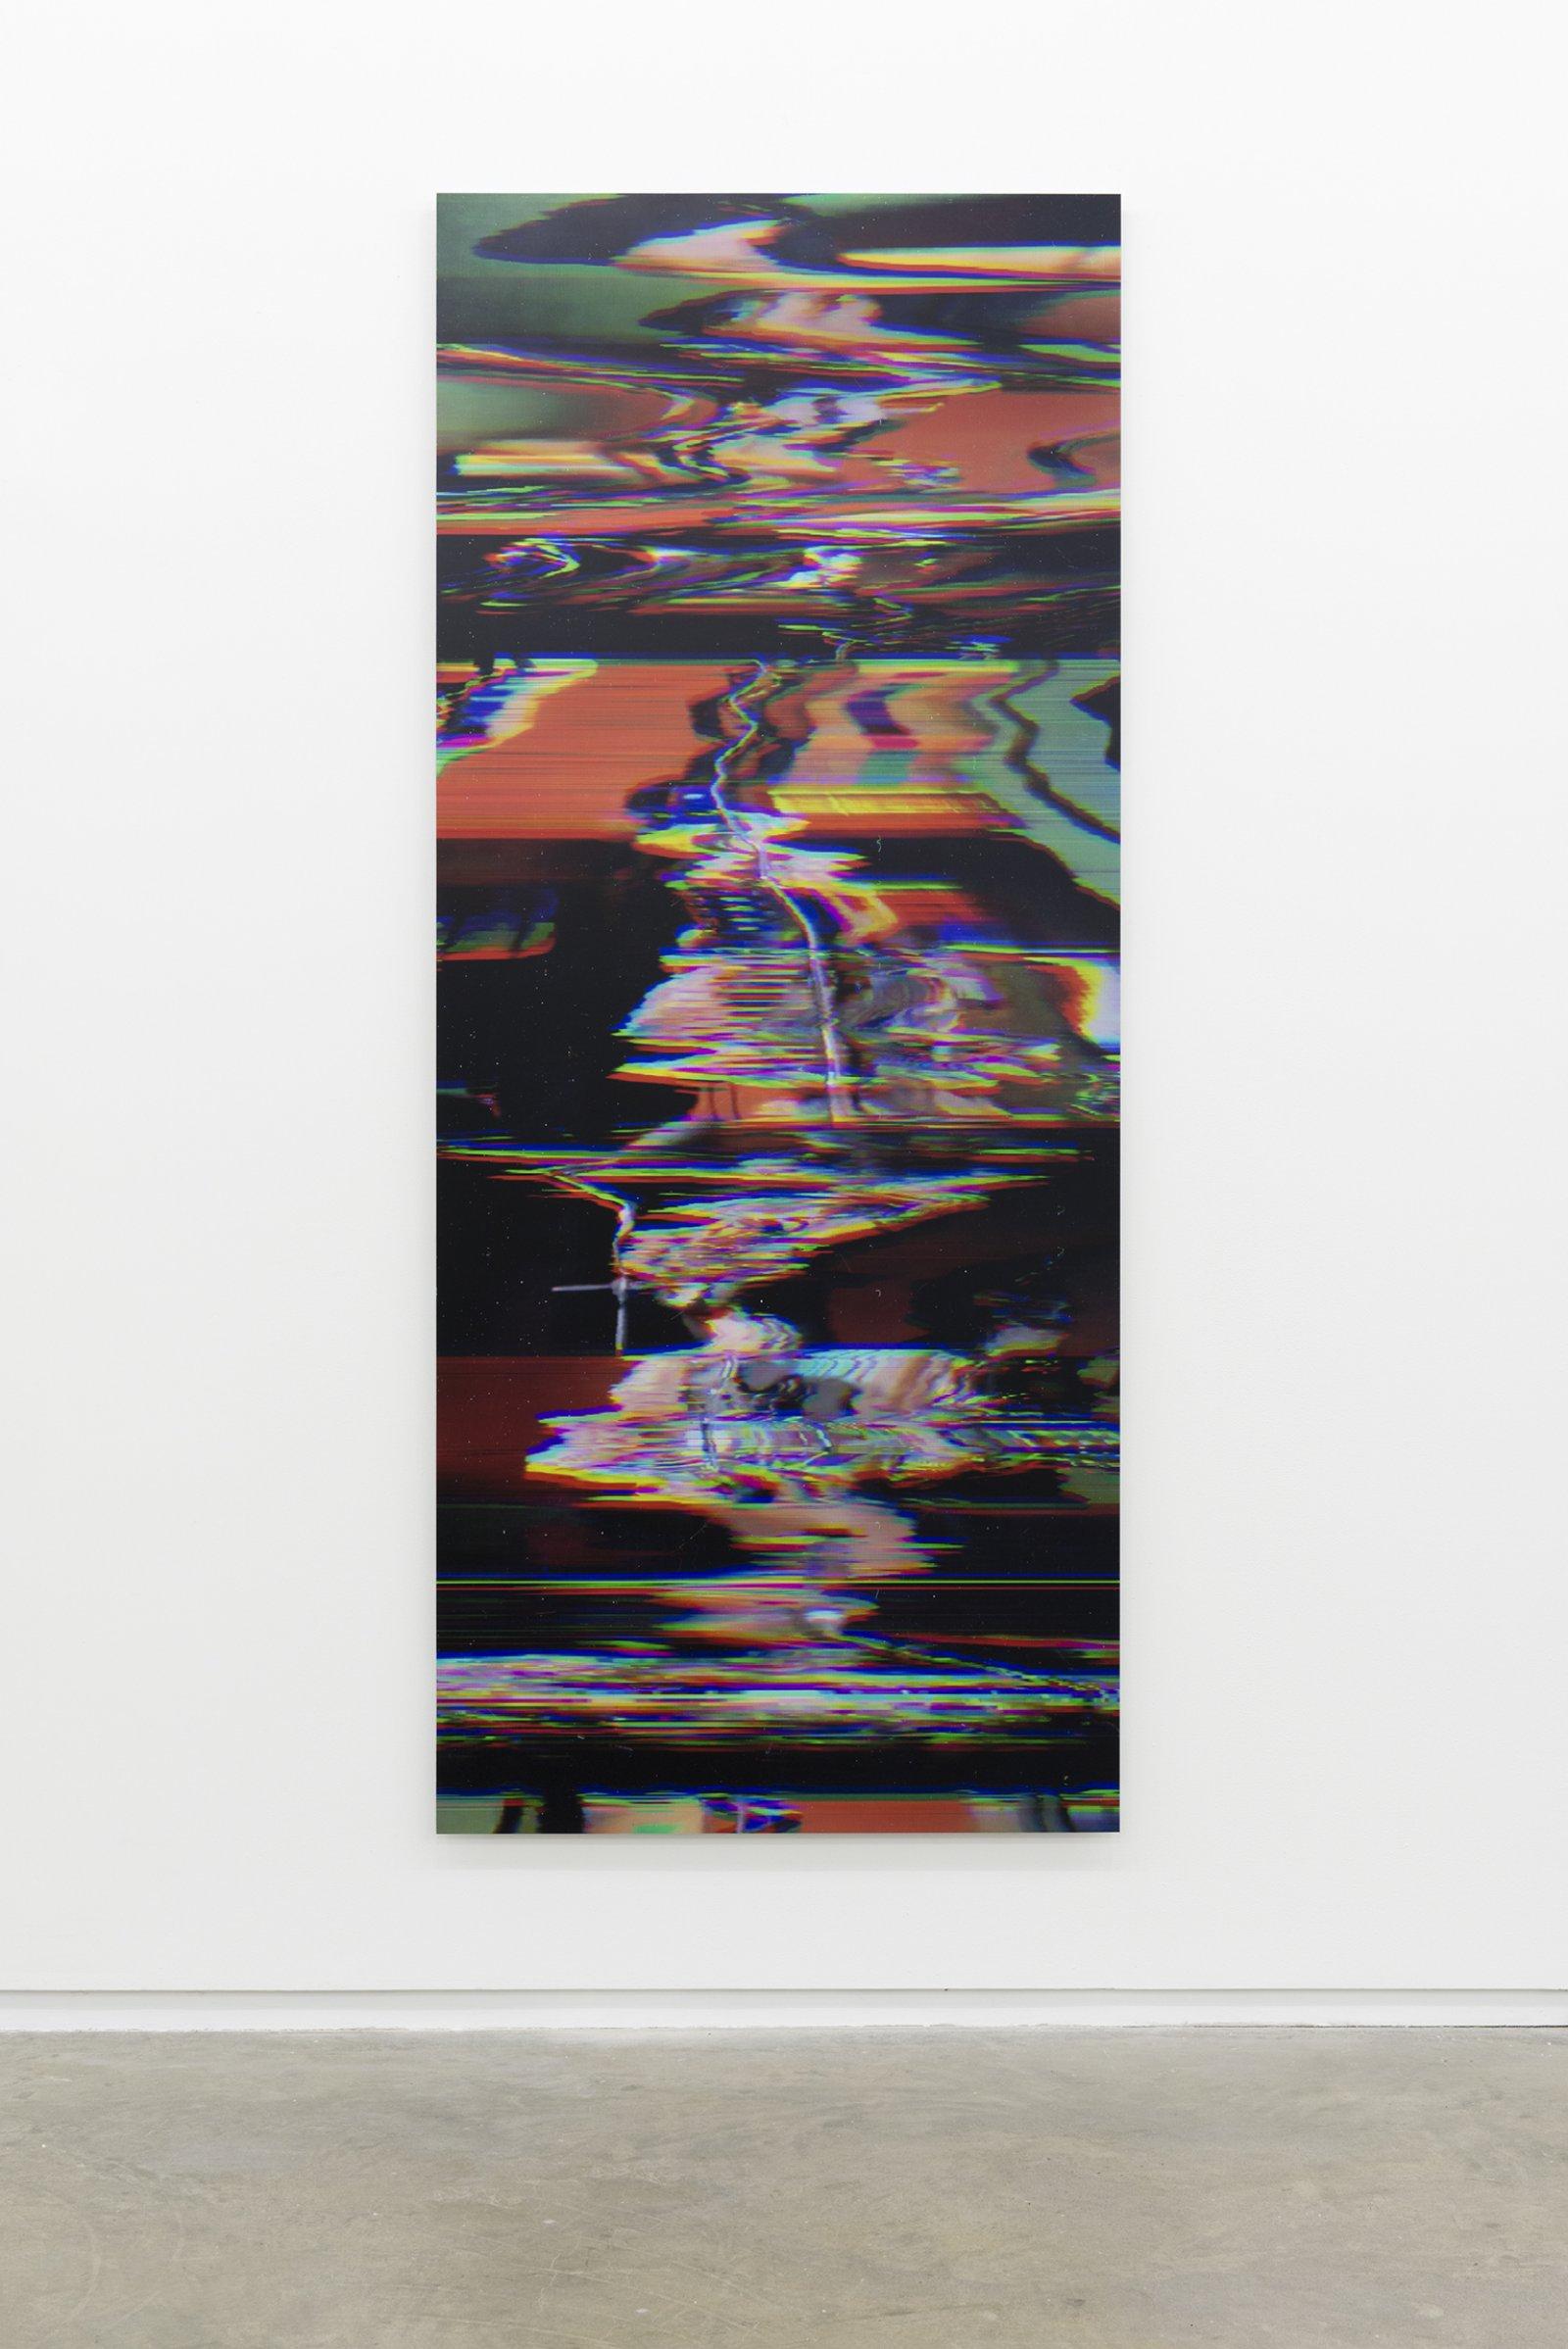 Raymond Boisjoly, Buffy Sainte-Marie (Illumination: 1969/2013) Keeper of the Fire 02, 2013, screen resolution lightjet print mounted on dibond, 96 x 40 in. (244 x 102 cm) by Raymond Boisjoly